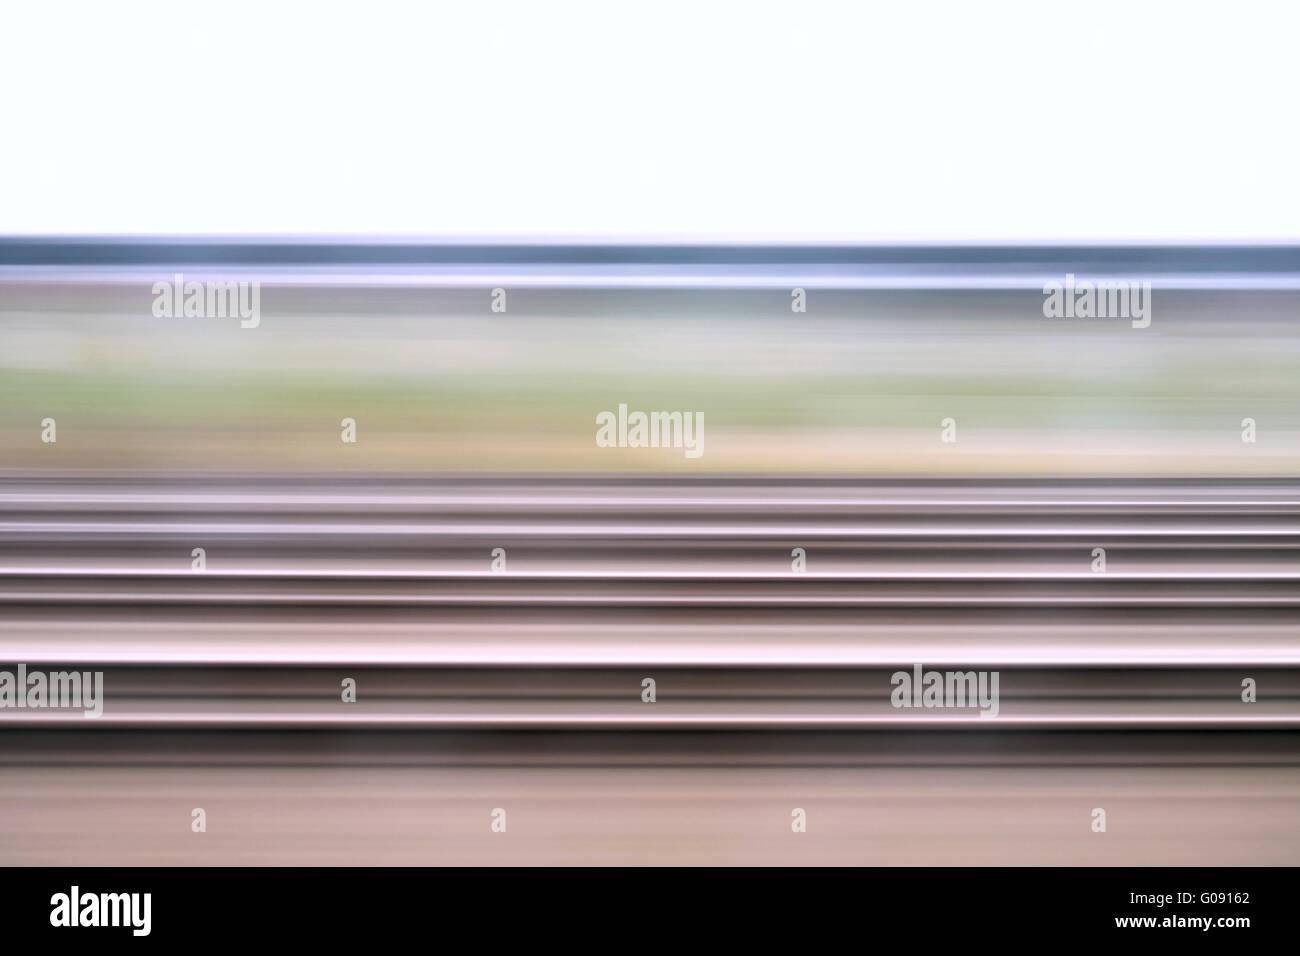 Train journey - Stock Image